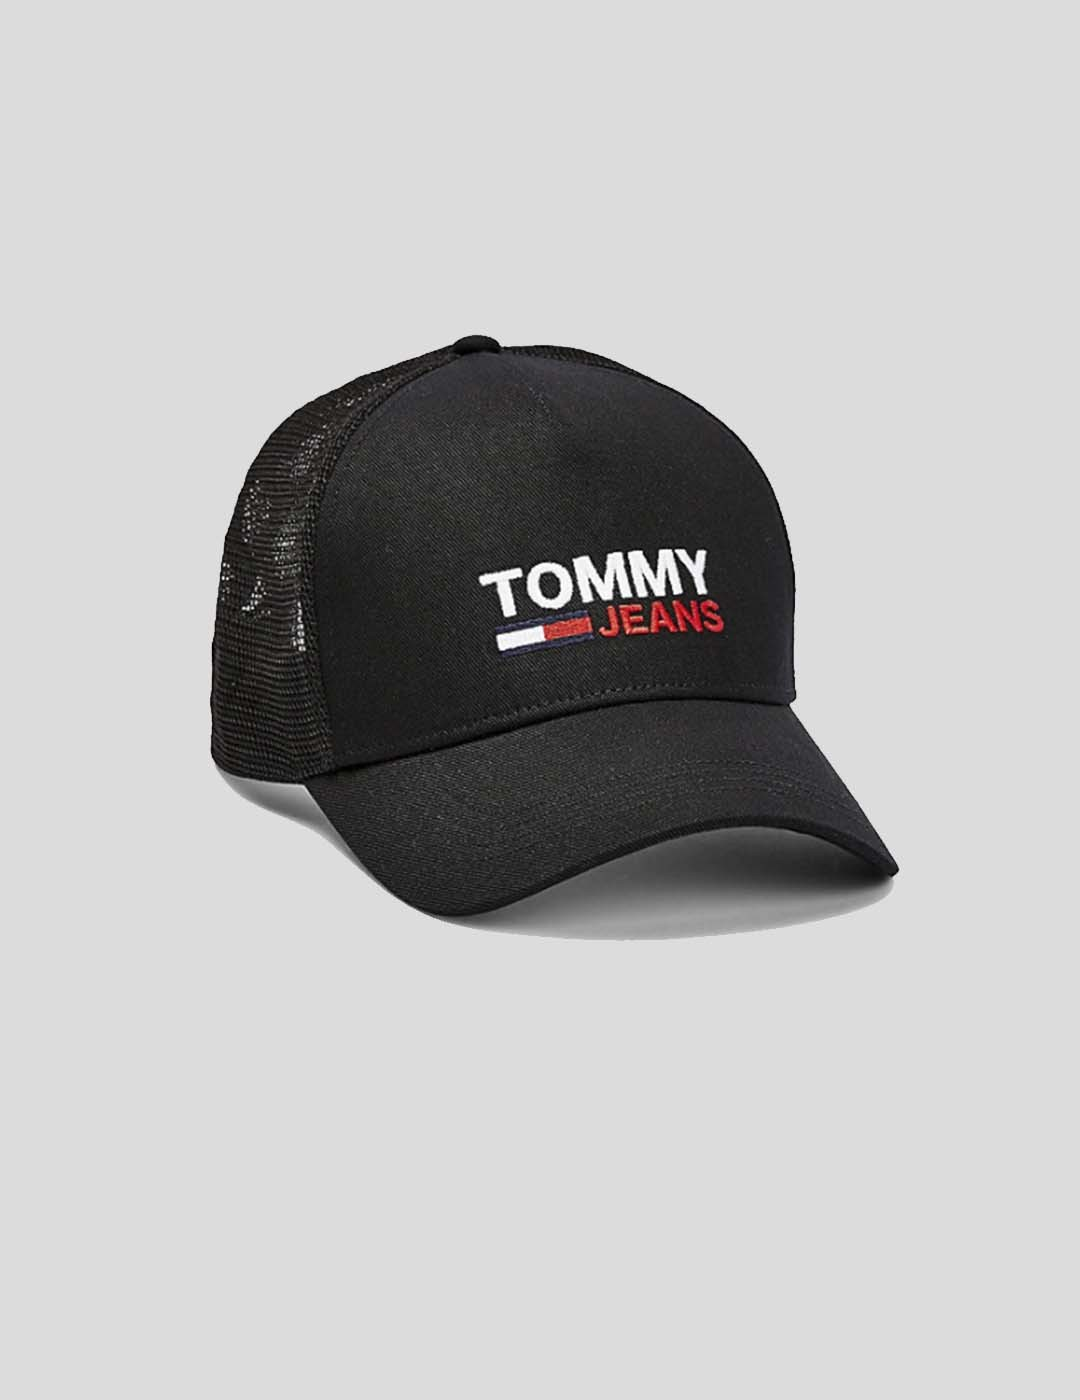 GORRA TOMMY JEANS TJM FLAG TRUCKER CAP BLACK